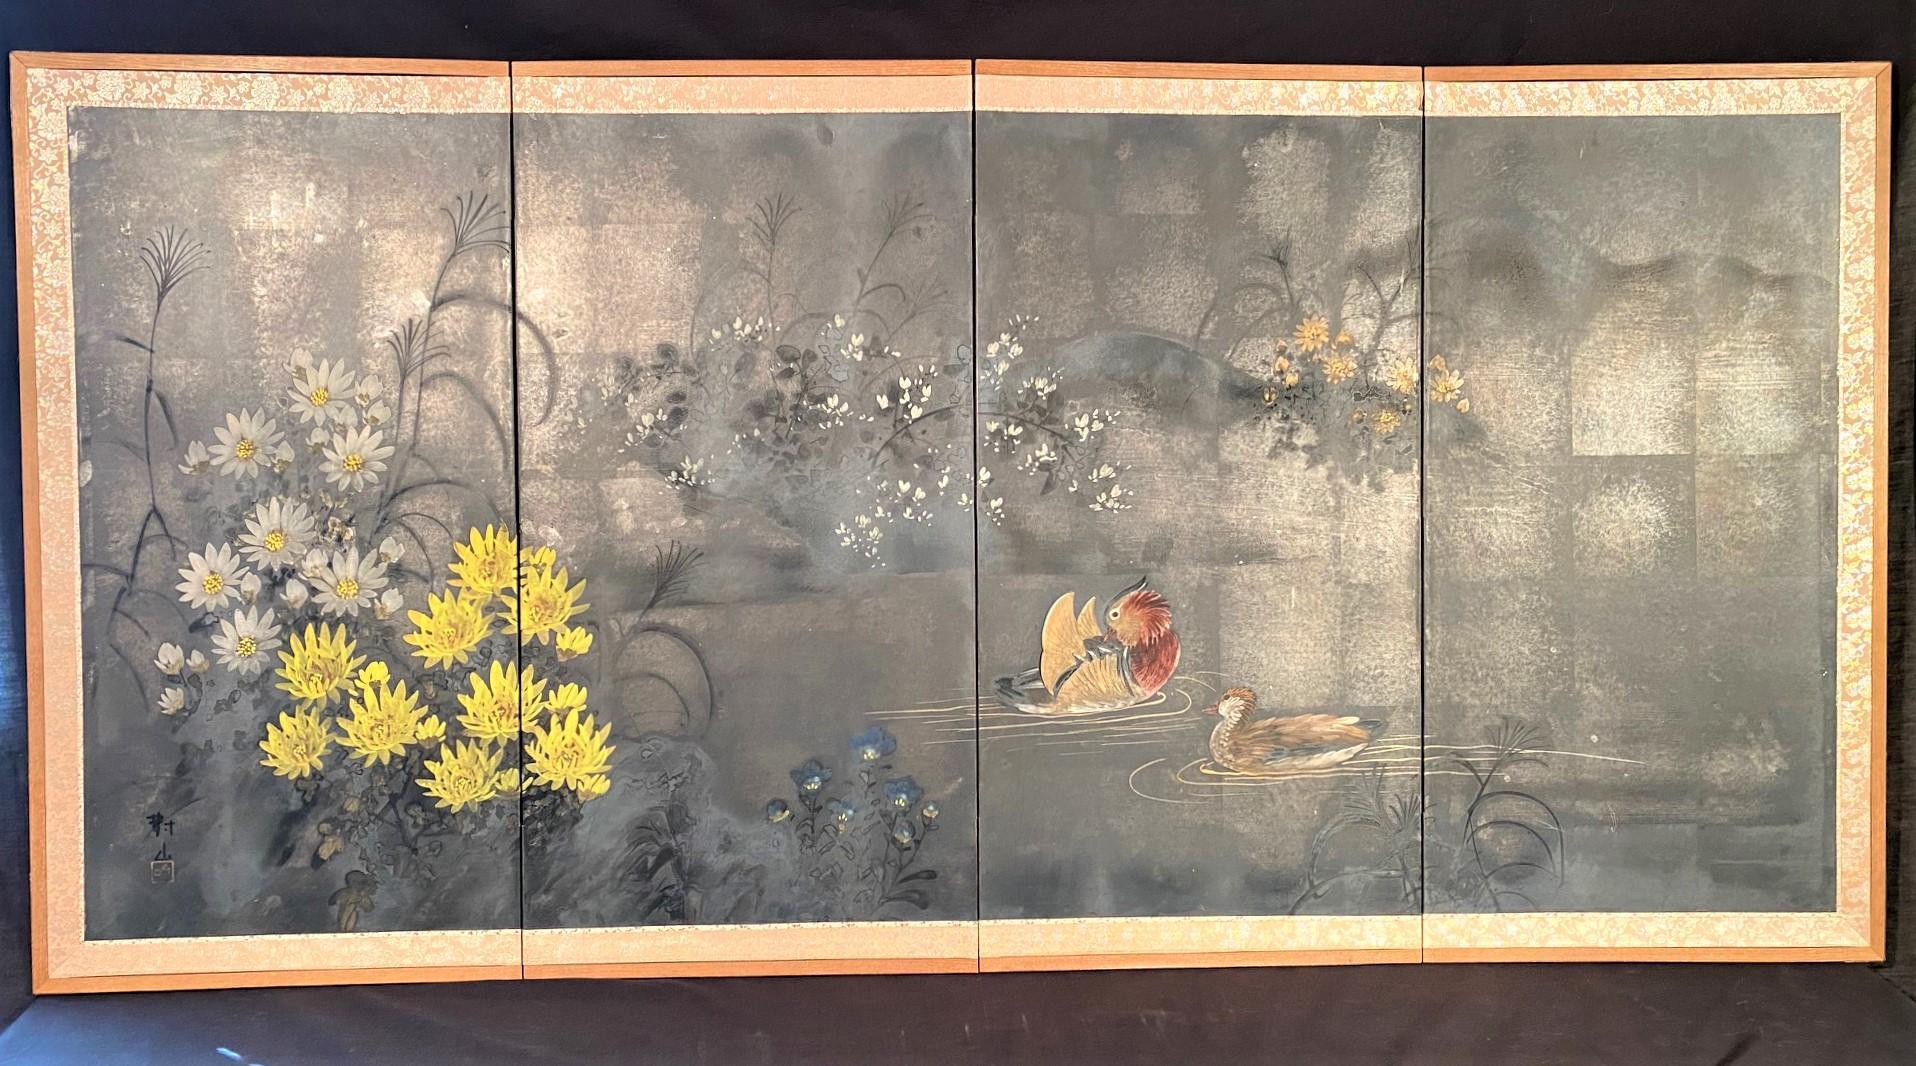 JAPANESE GOLDEN SILK SCREEN MEASURING 36in x 73in